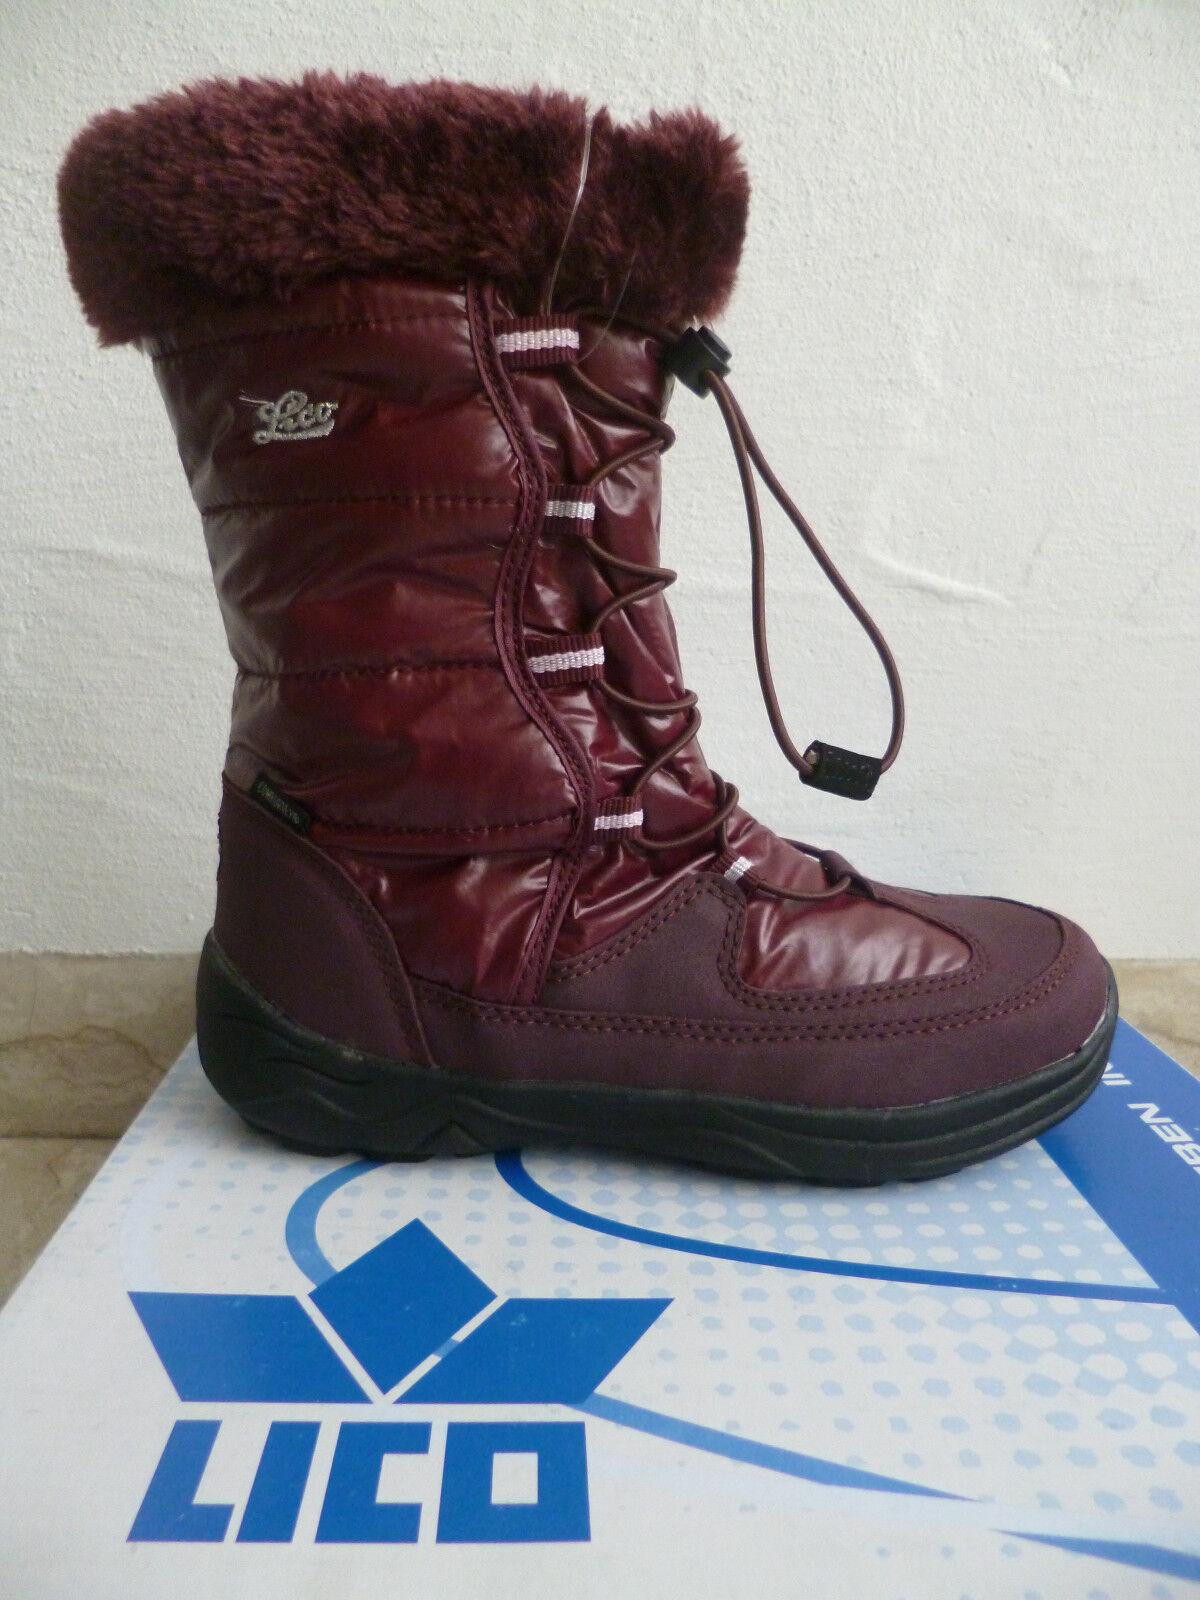 buy popular 87b20 8b0ab Lico Mädchen Stiefel Winterstiefel Boots bordo wasserdicht NEU!!